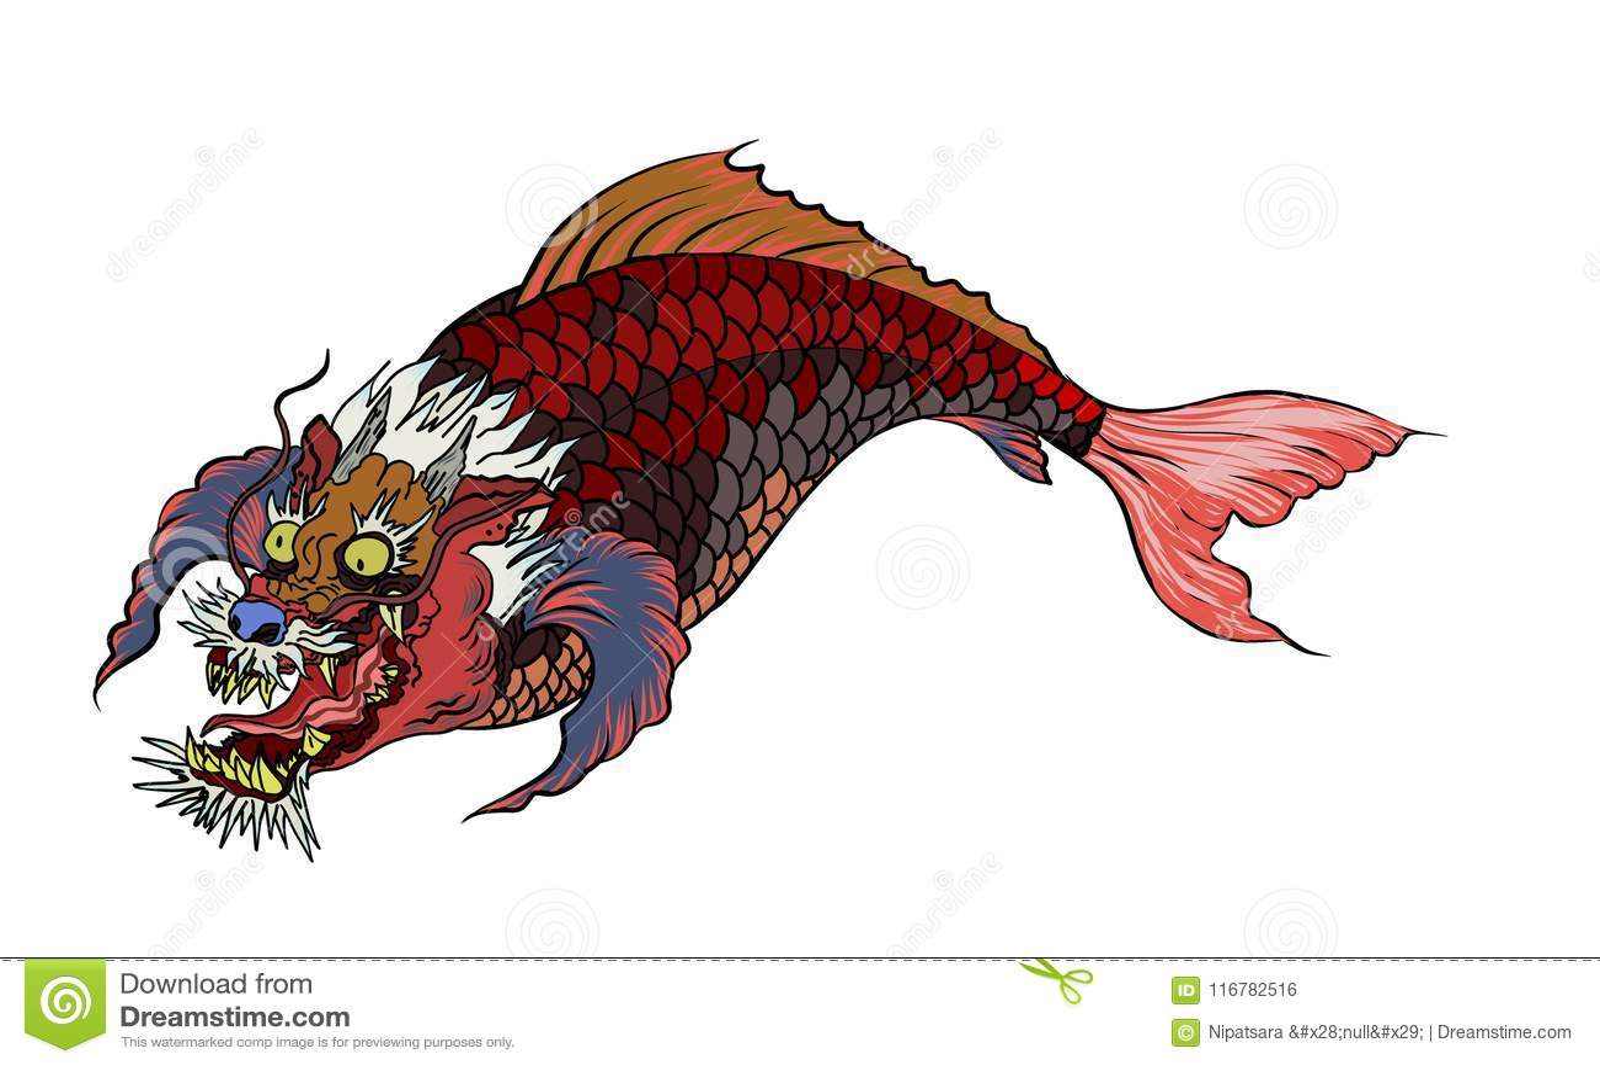 Dragon Head And Koi Carp Fish In Circle Design For Tattoo Stock ...